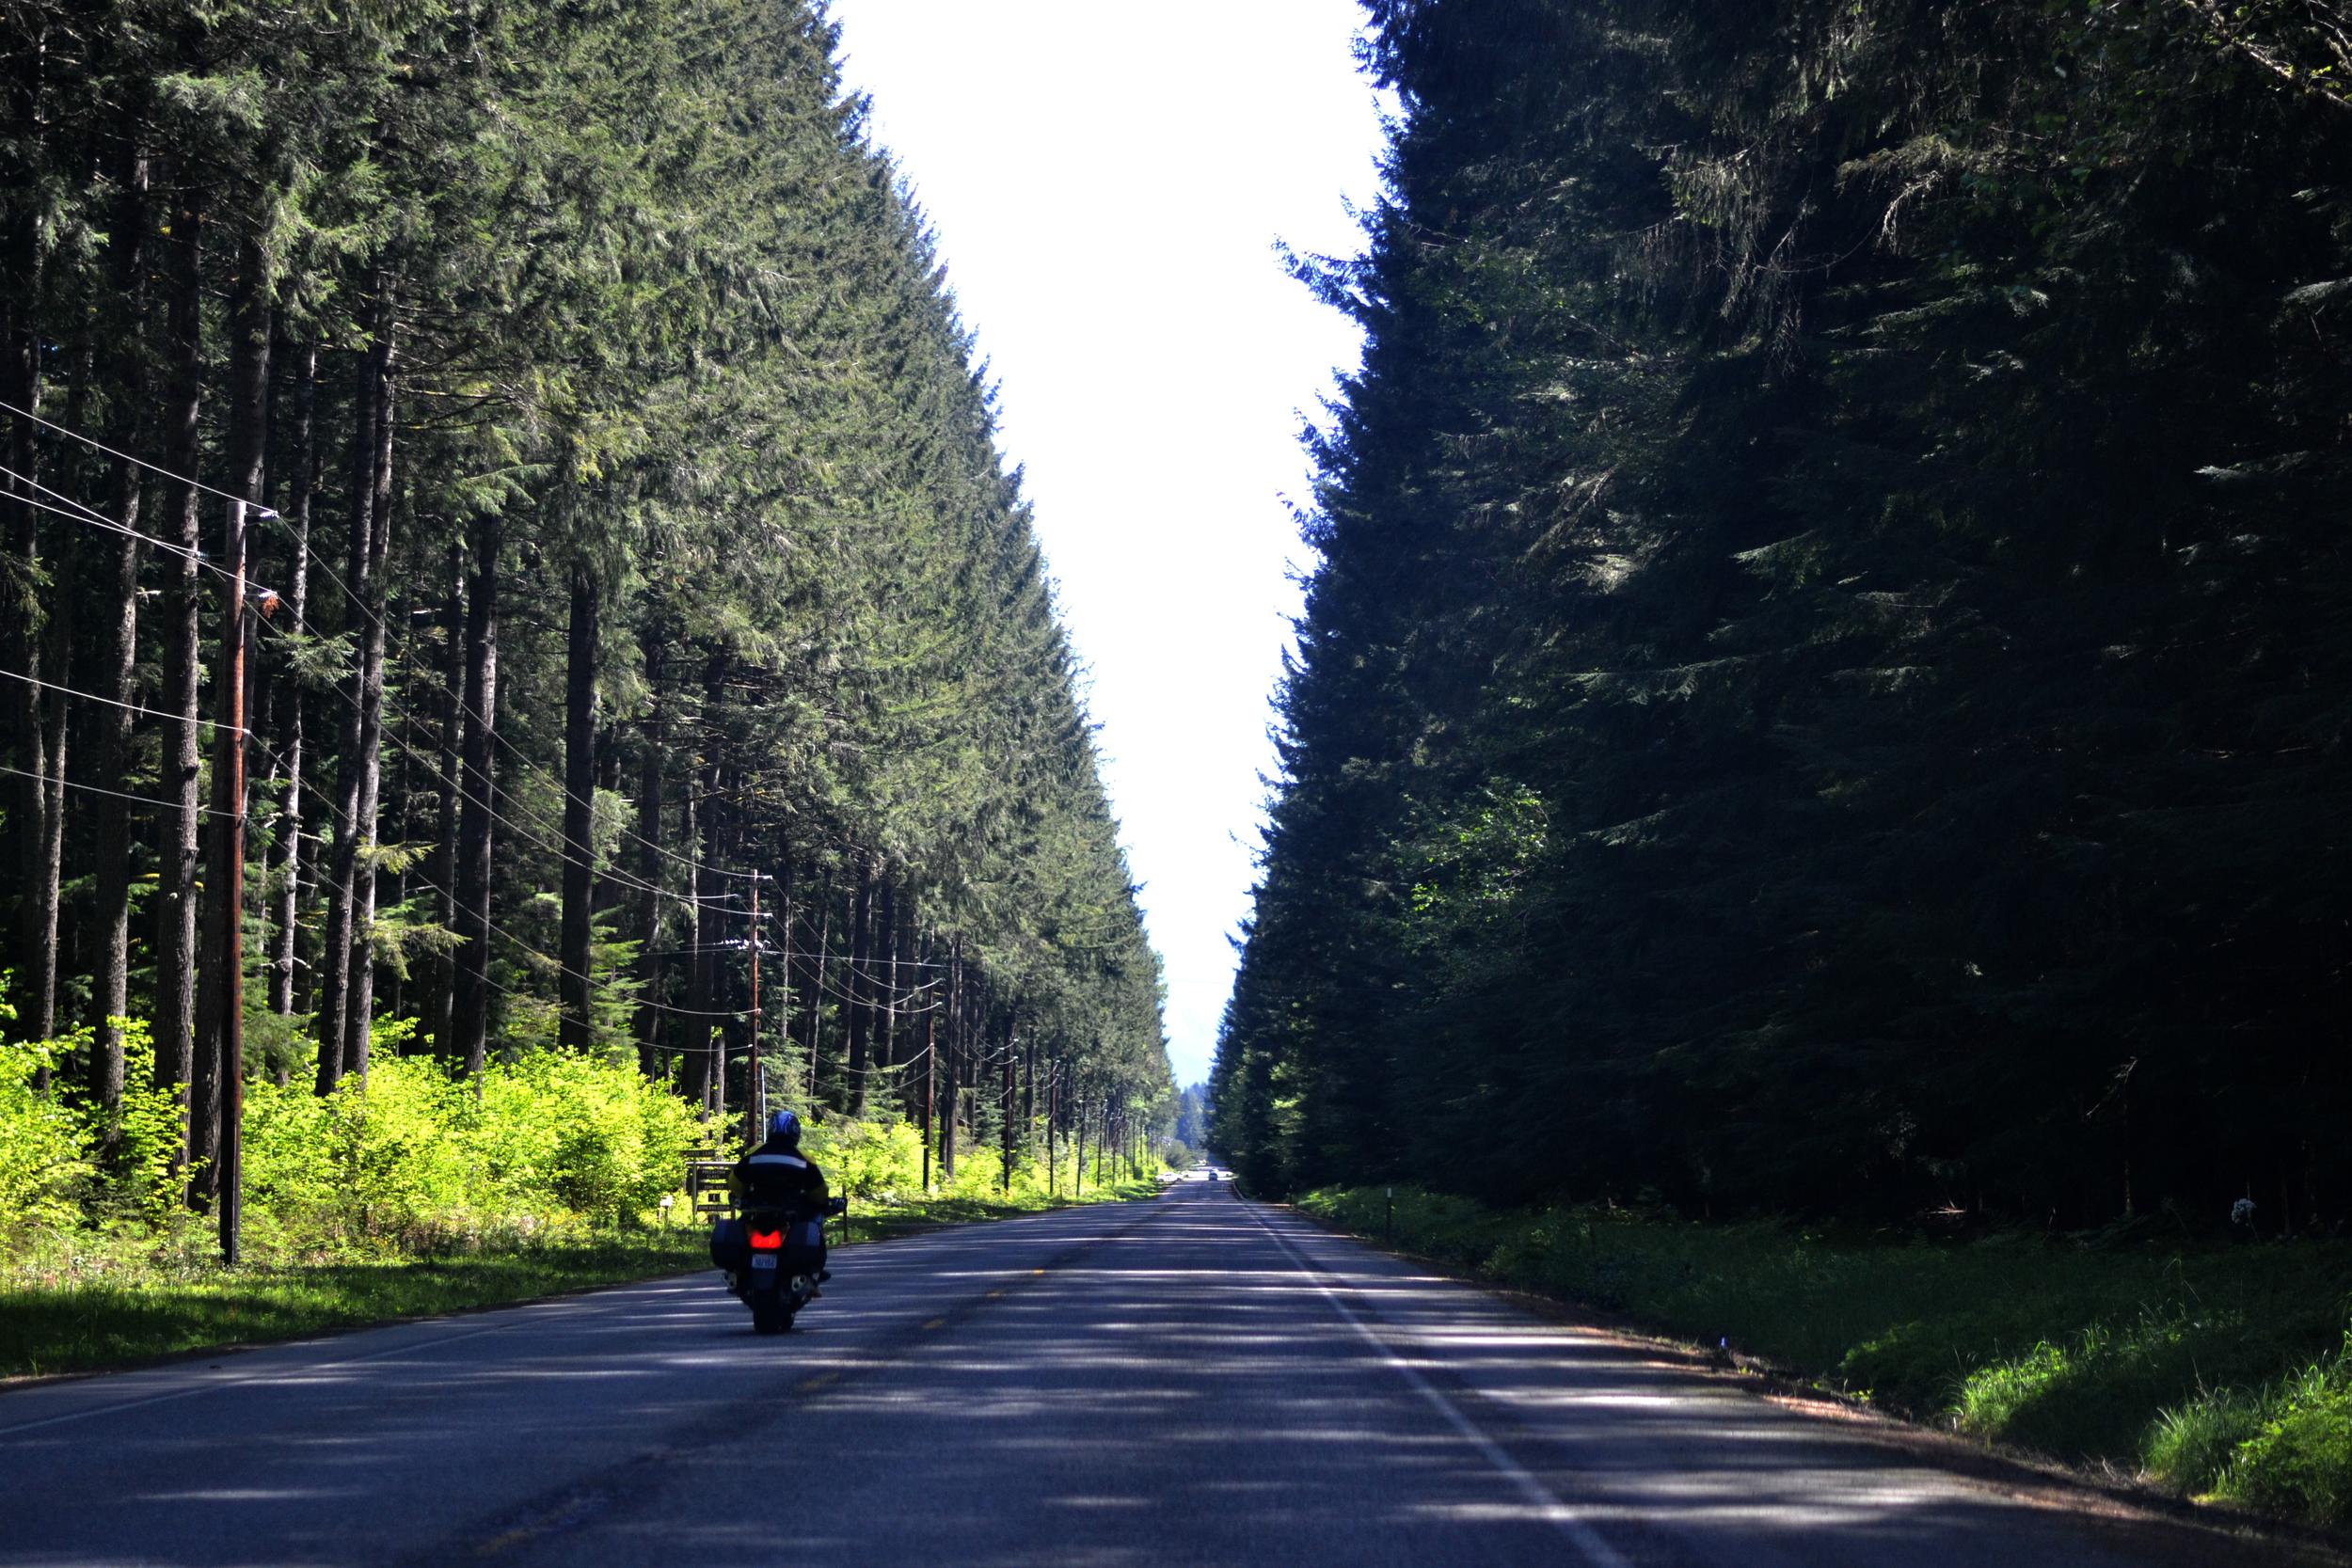 Roadtrippin' to Mount Rainier